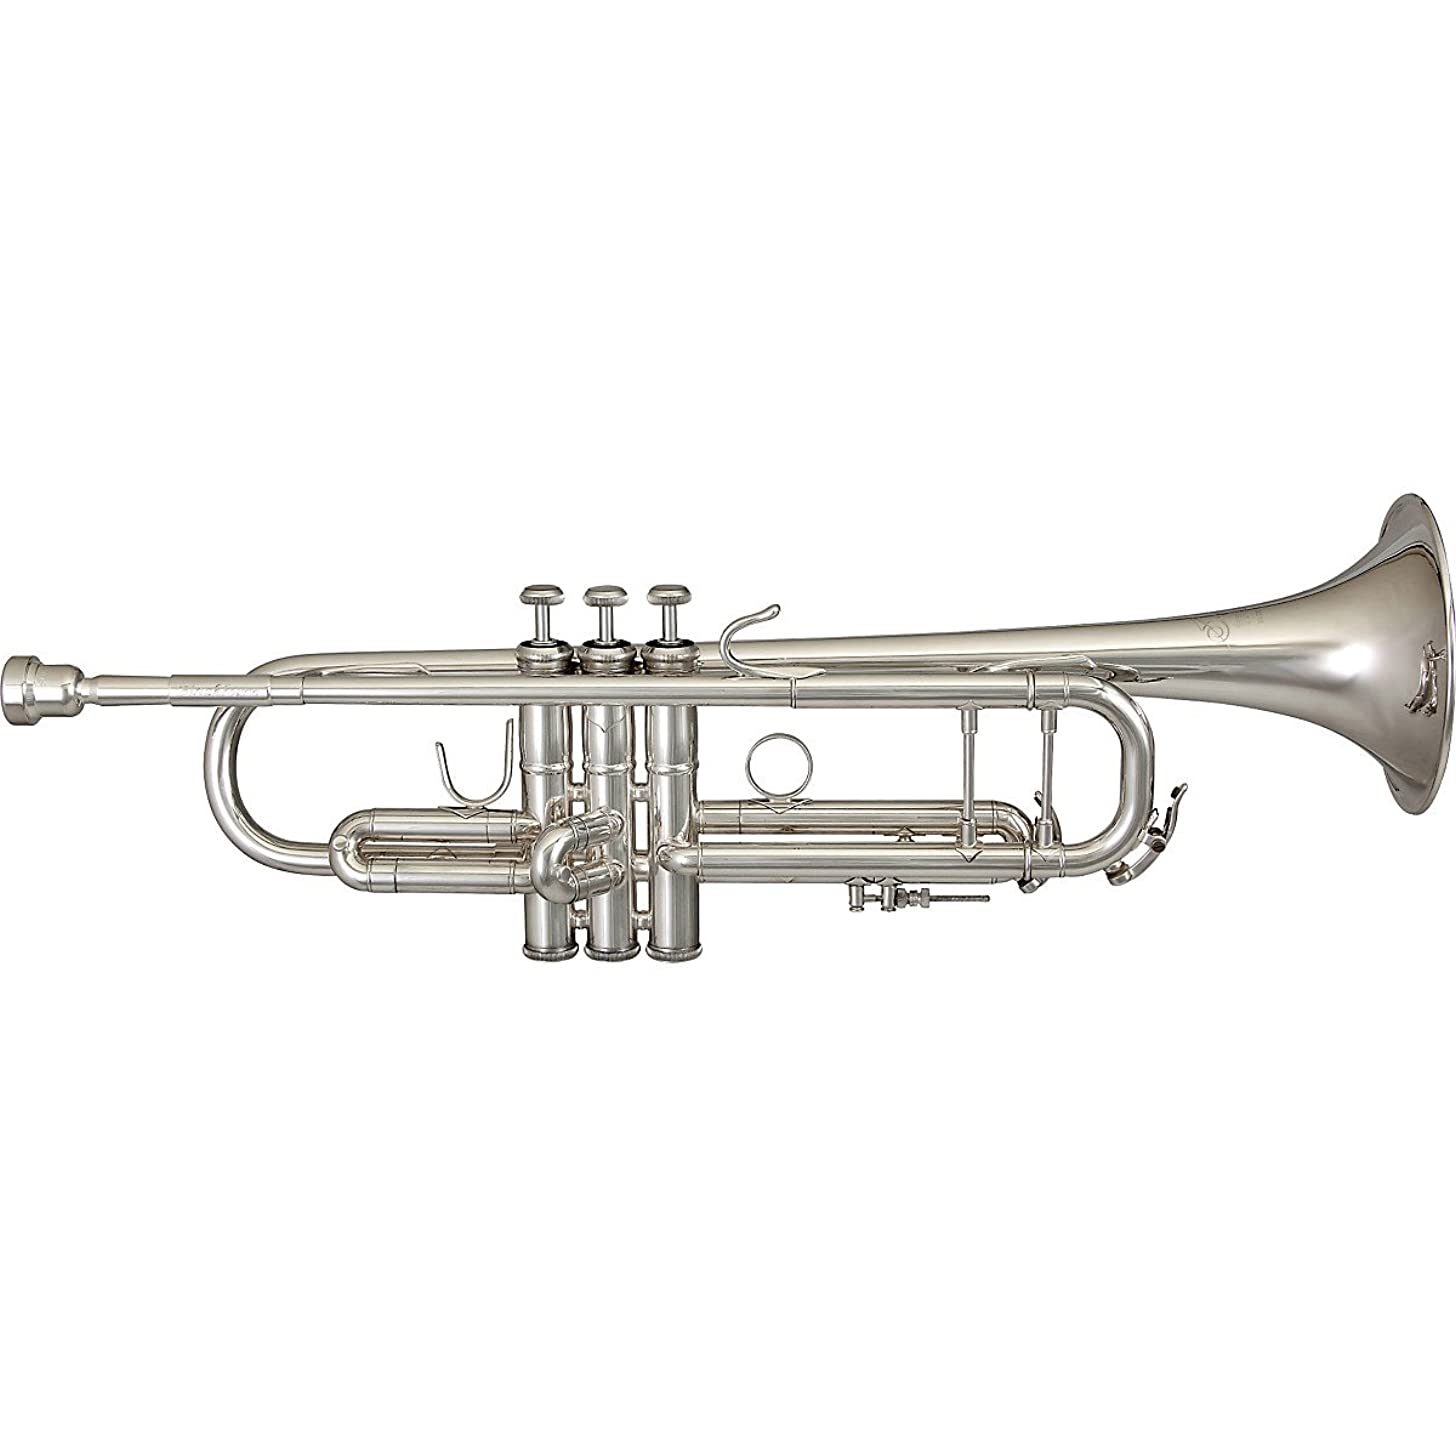 Sonare TRB801S Bb Trumpet with Adjustable Valve, Silver